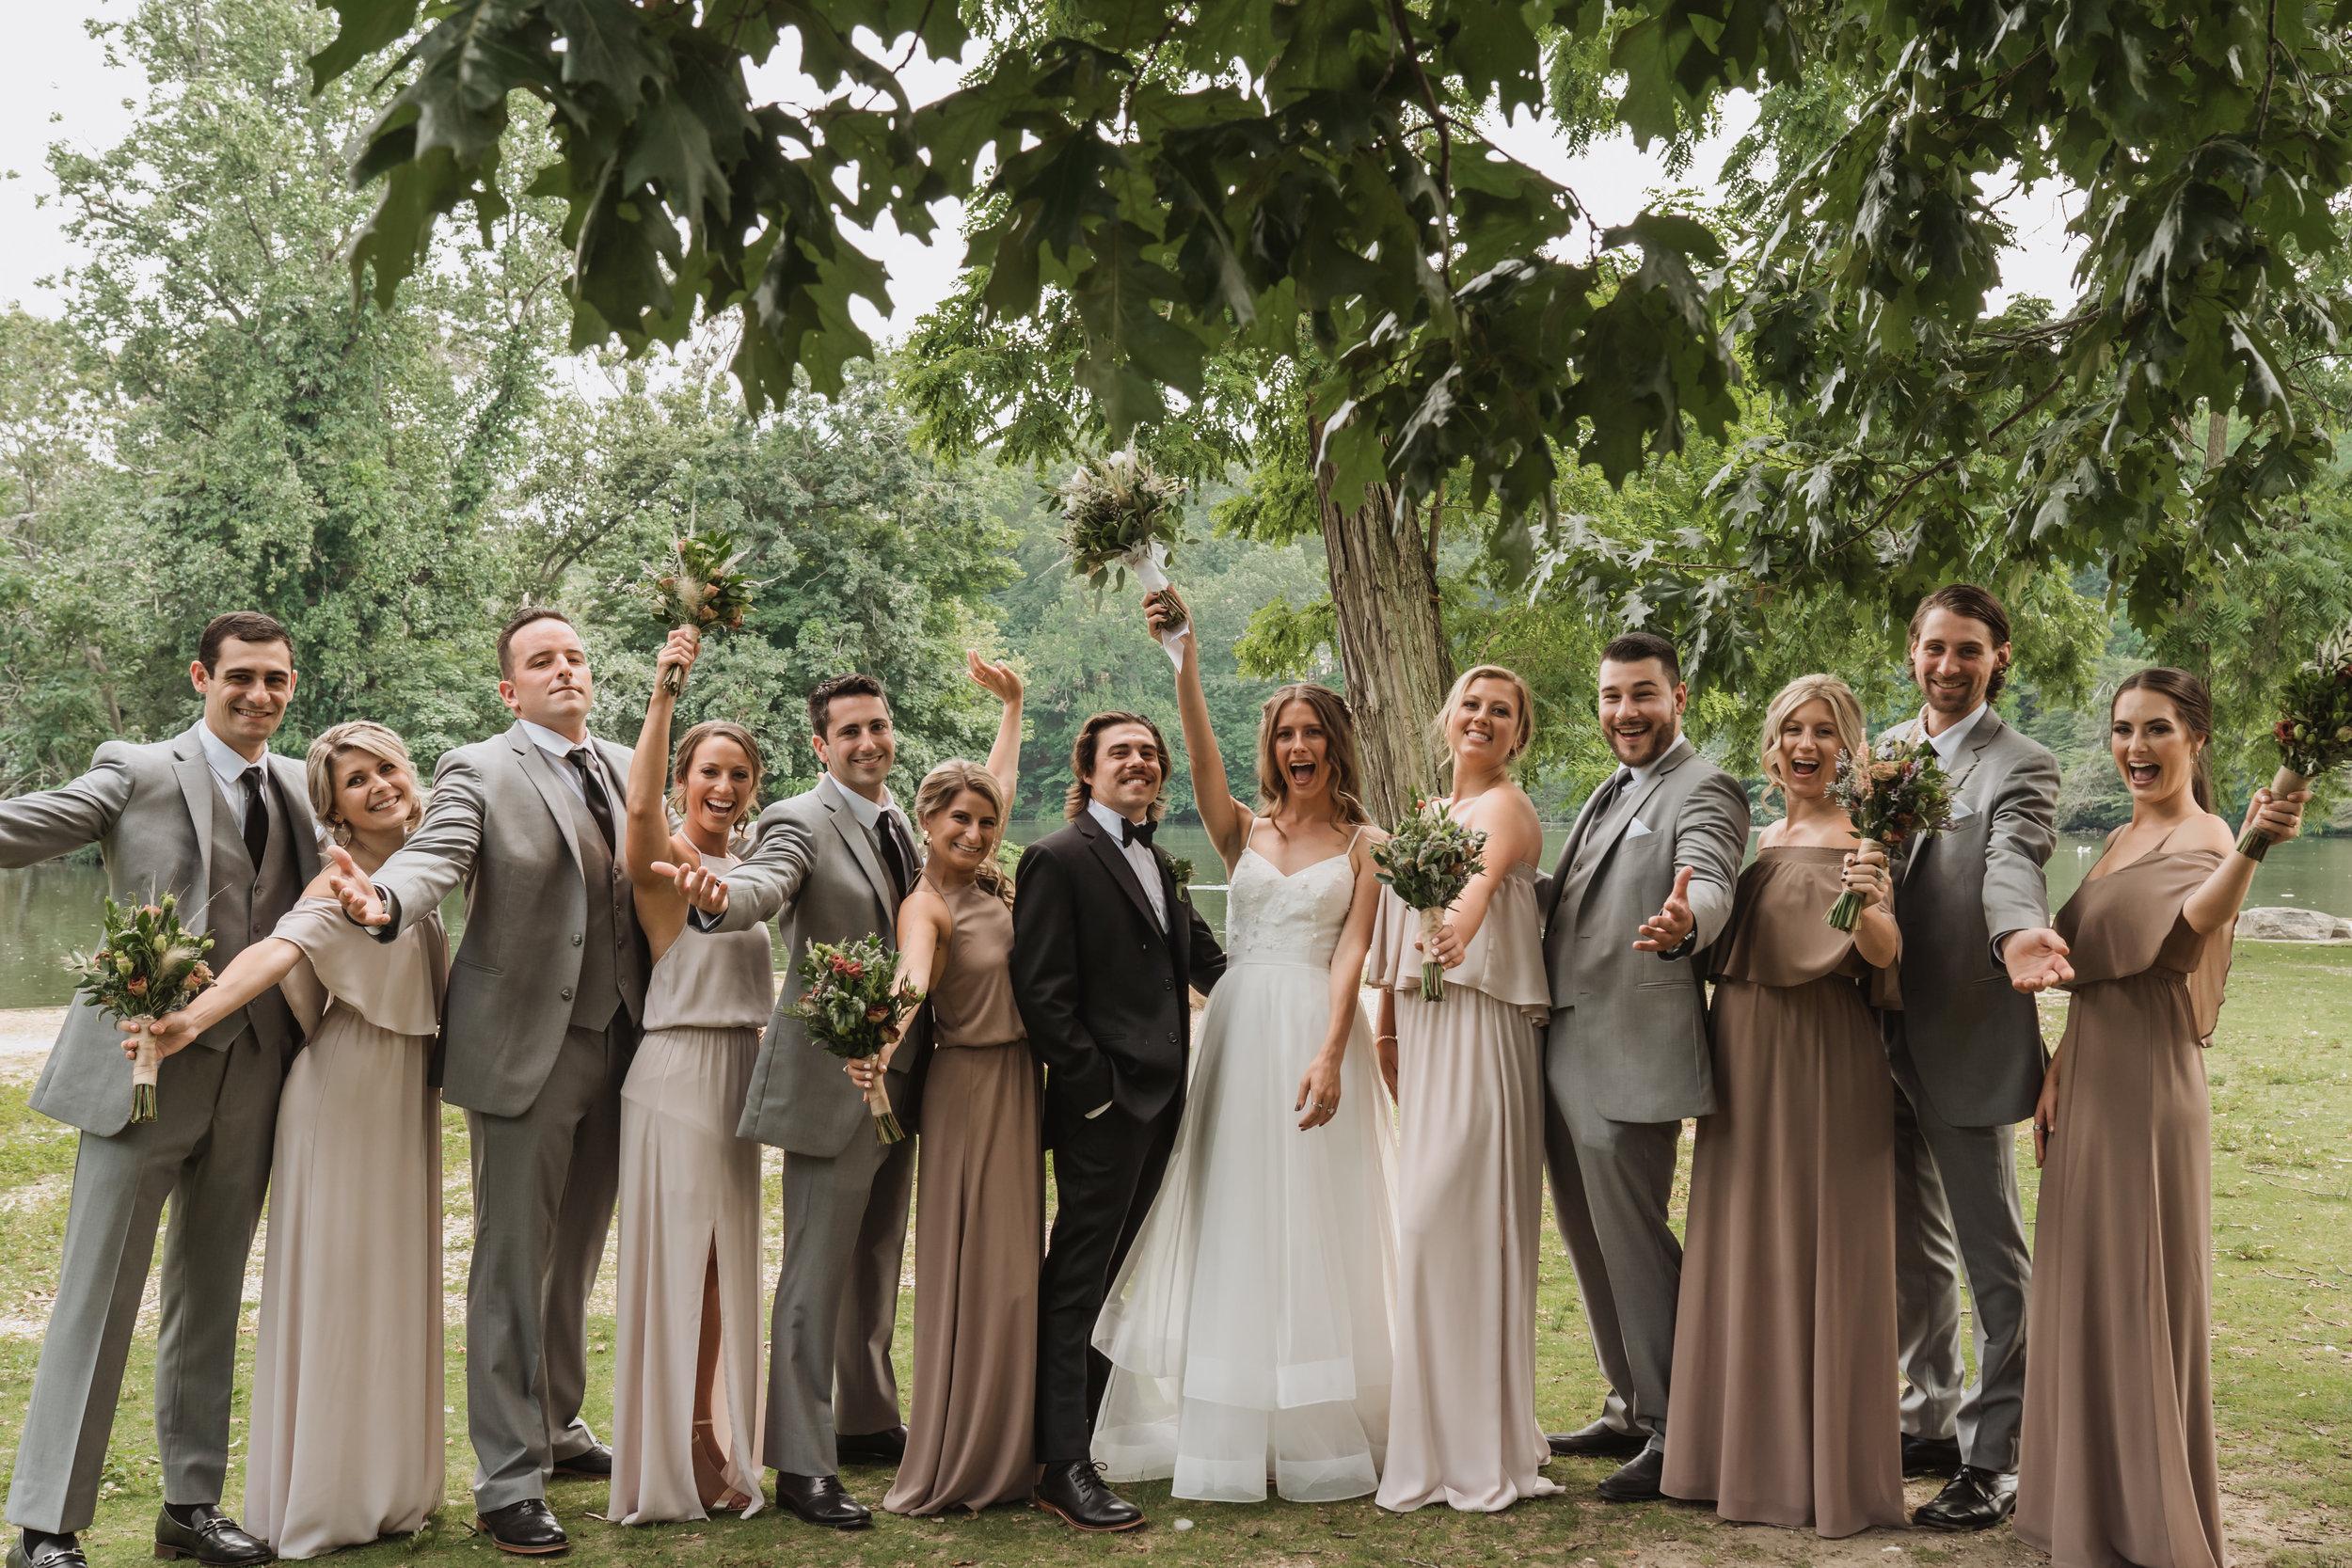 JJP_Emily&Joey_Summer_Old Field Club Wedding_21.jpg